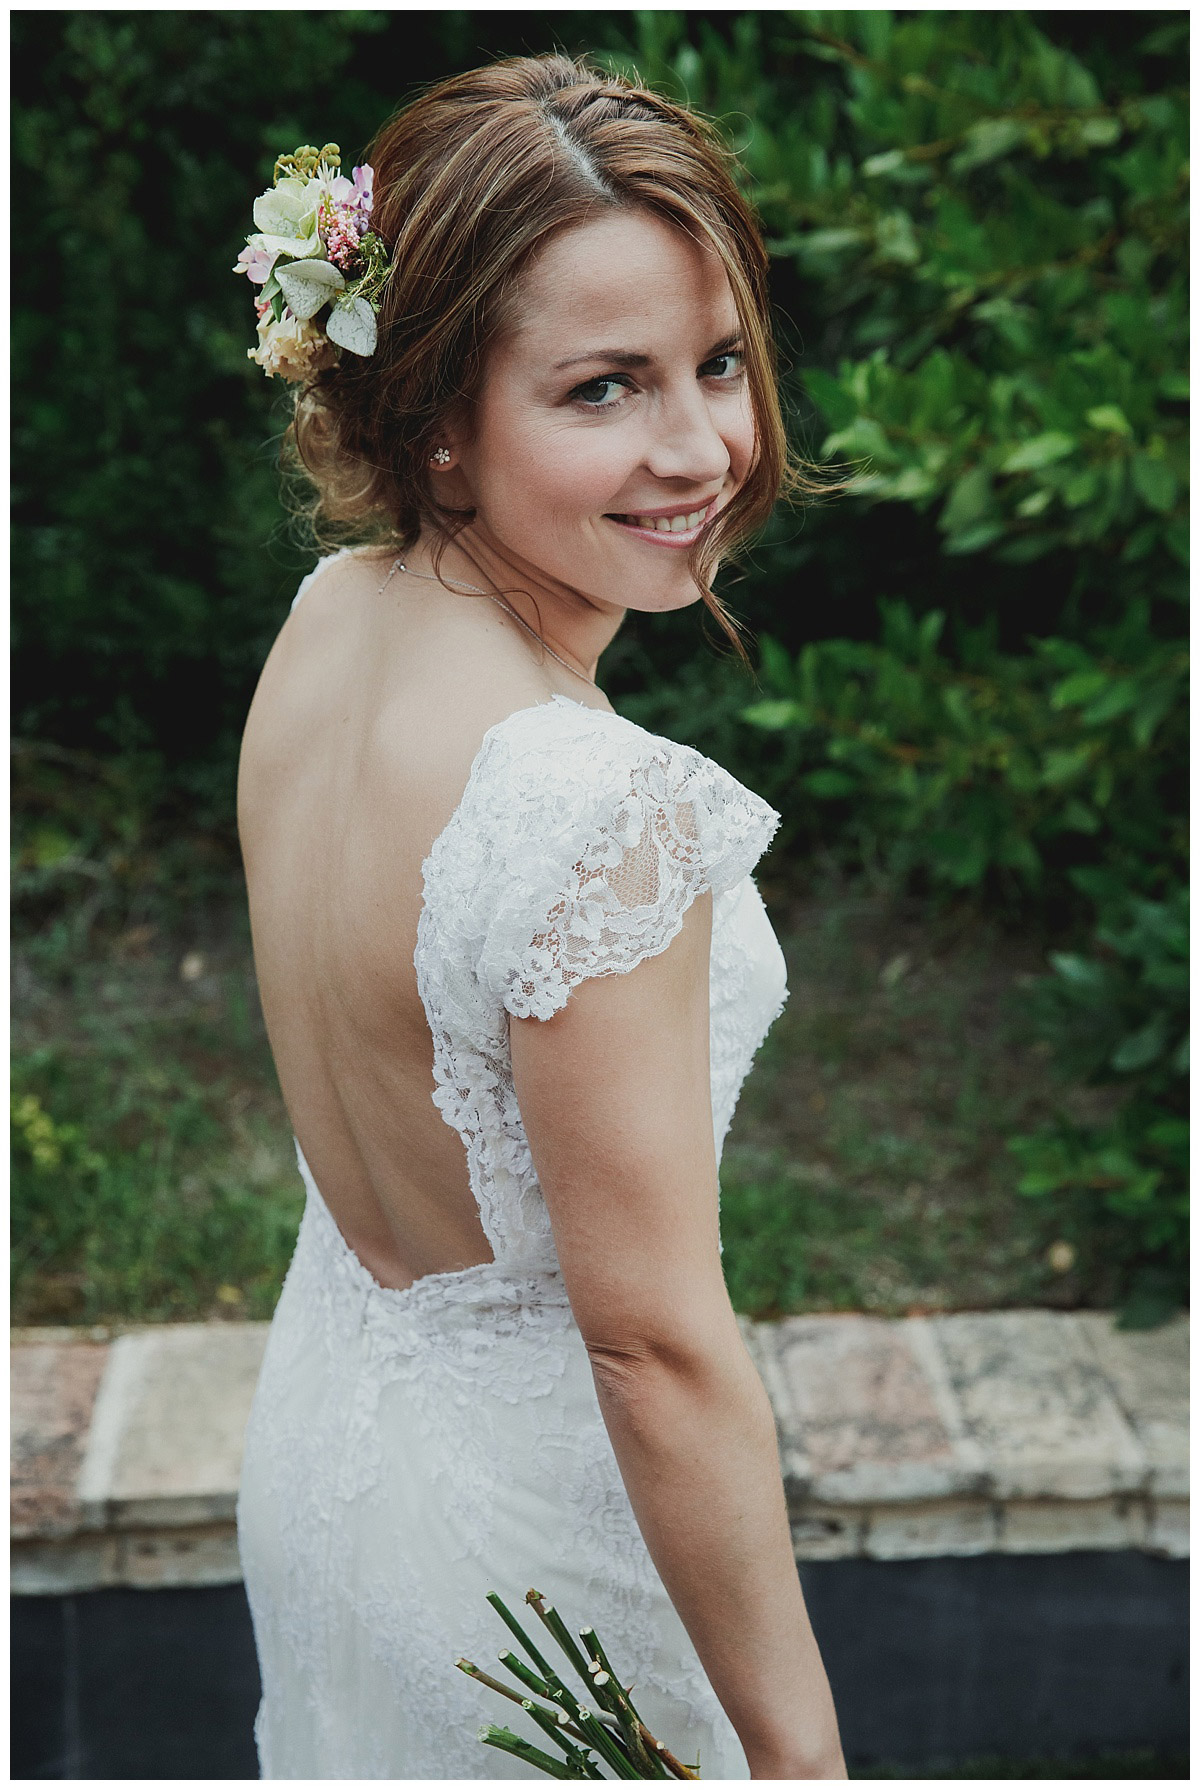 Wedding Photographer Toledo - Fotógrafo de Boda - El Cigarral de las Mercedes